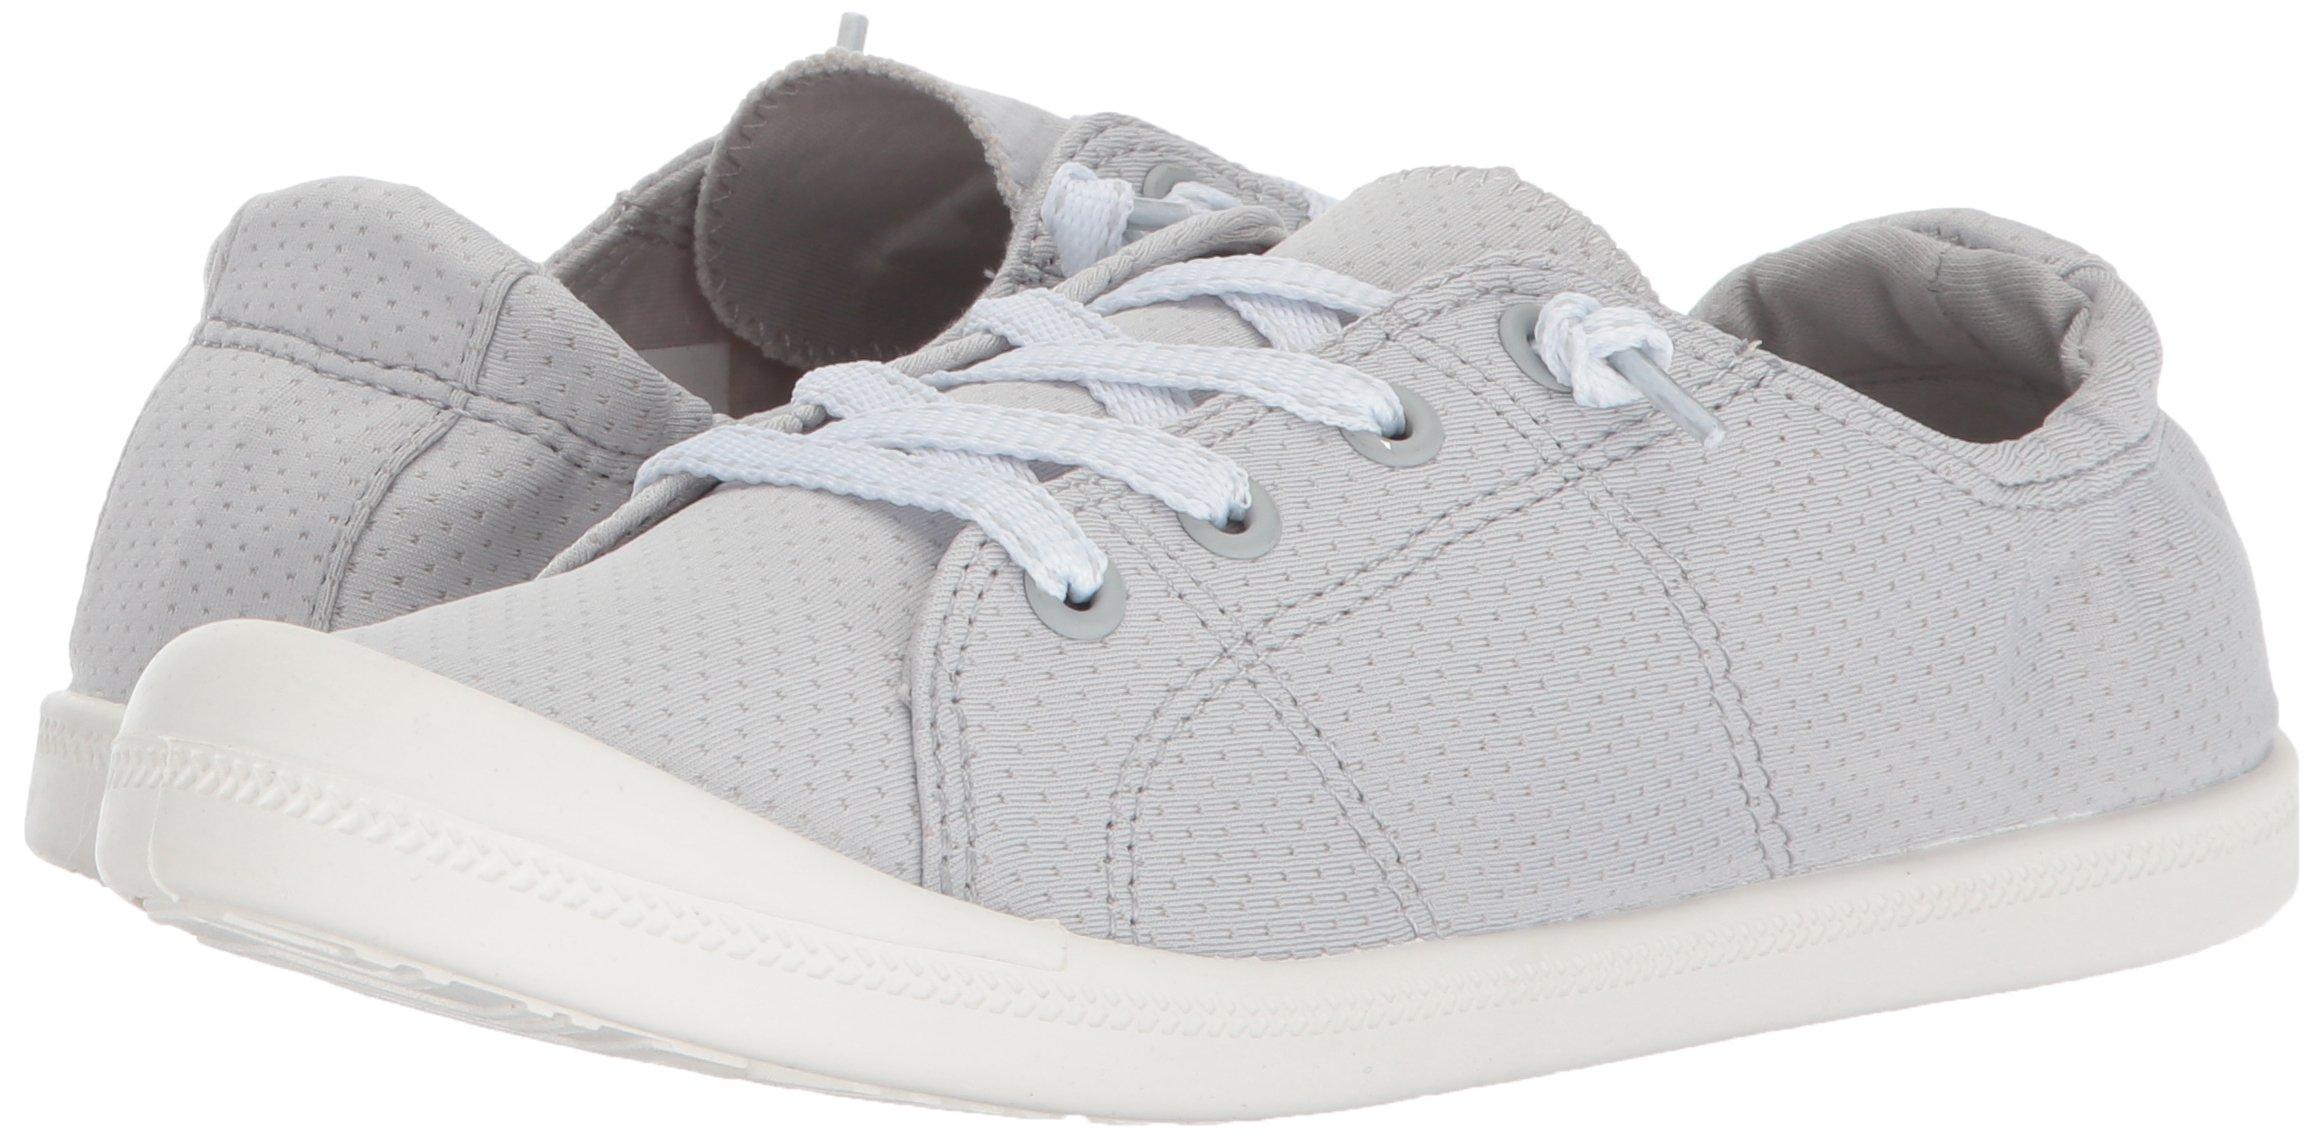 574aee8a3fe Madden Girl Women s Bailey-P Sneaker